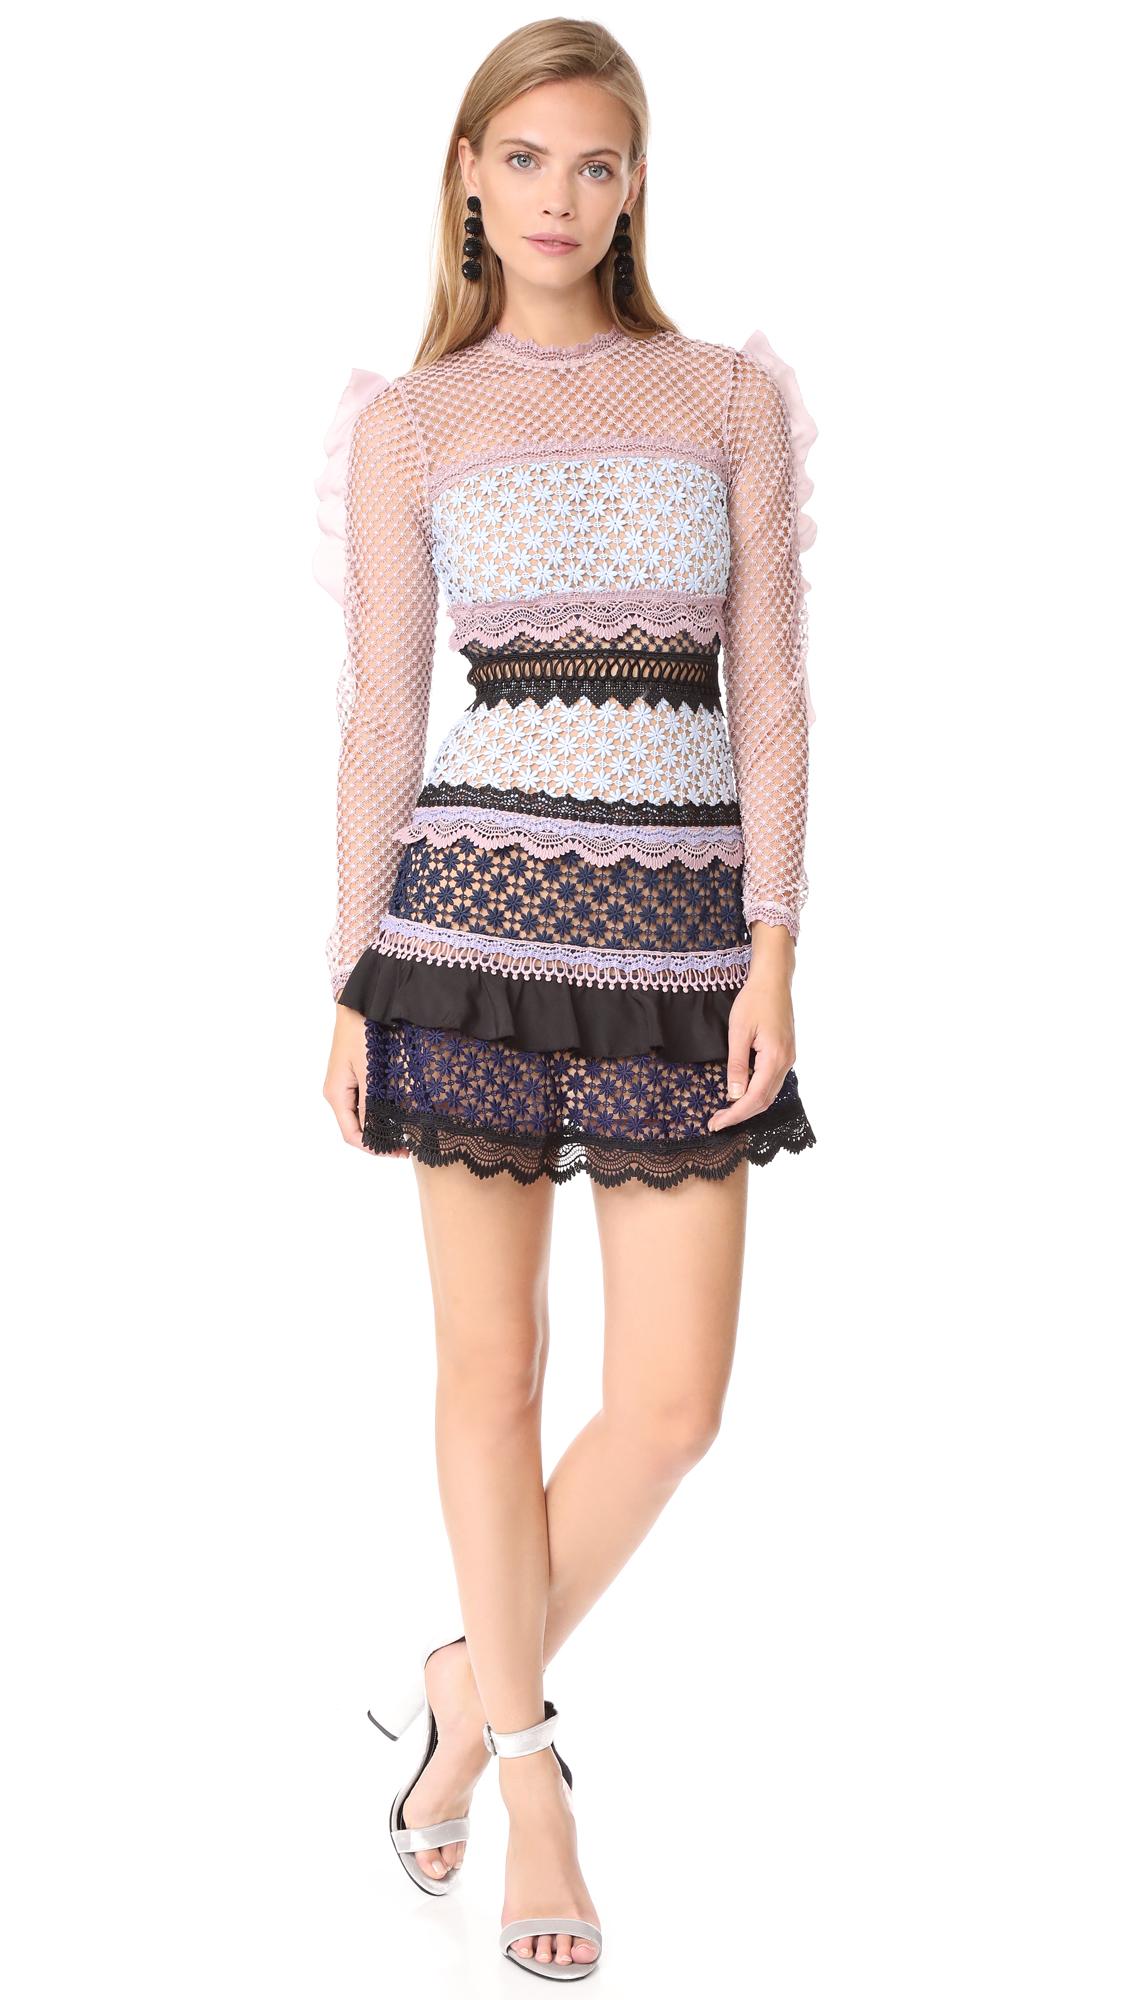 f20d9c42015a Self Portrait Bellis Lace Trim Dress with Frilled Sleeves | SHOPBOP